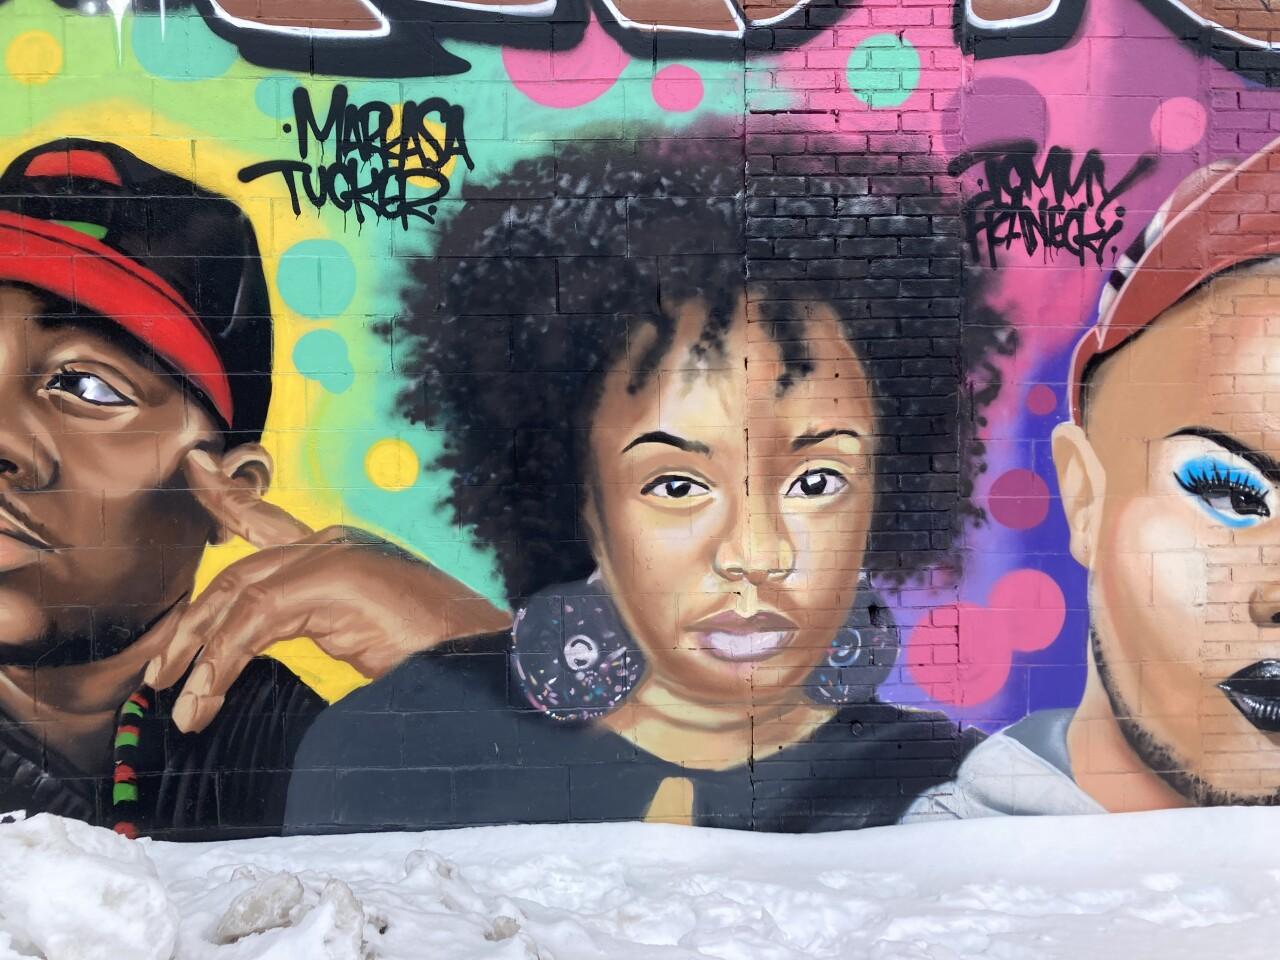 Markasa Tucker on the Activist Mural near 14th & Vliet